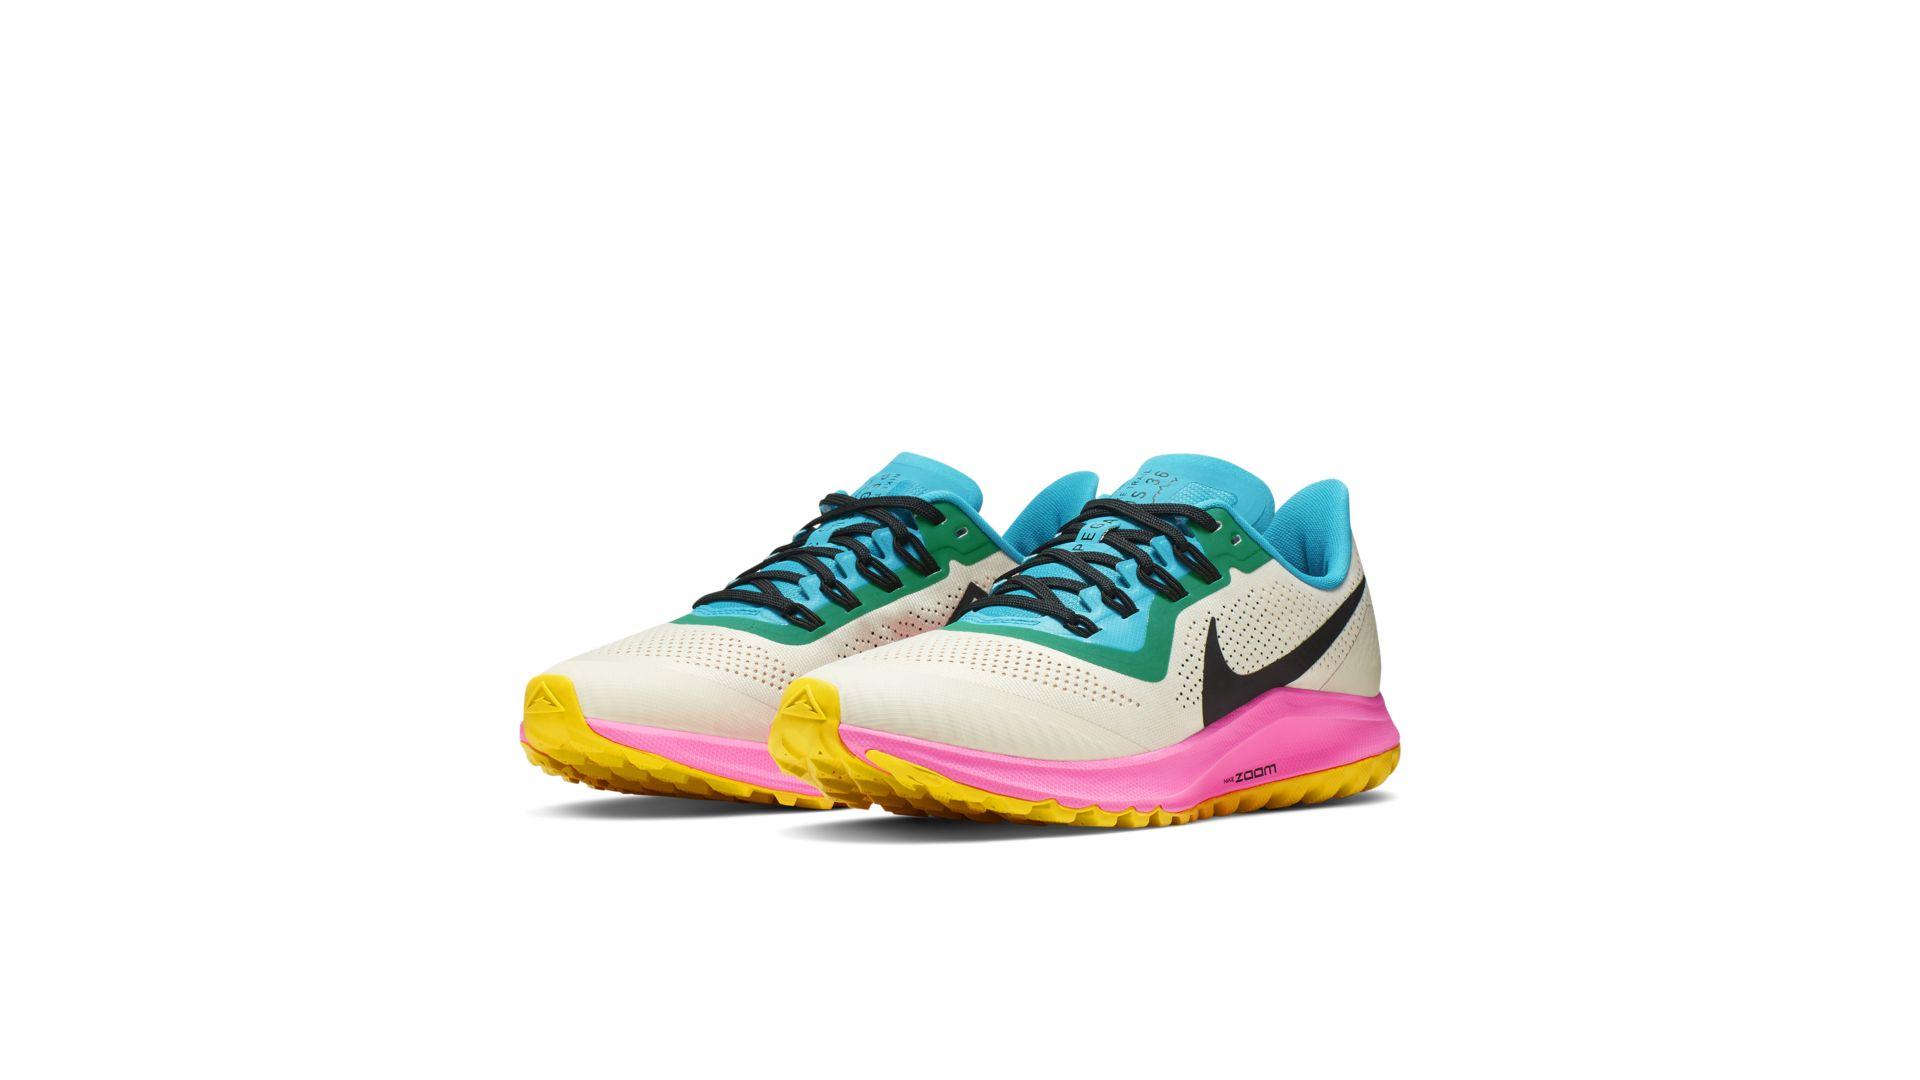 Nike Air Zoom Pegasus 36 Trail Light Orewood Brown Pink Blast Blue Lagoon  (W) (AR5676-101)